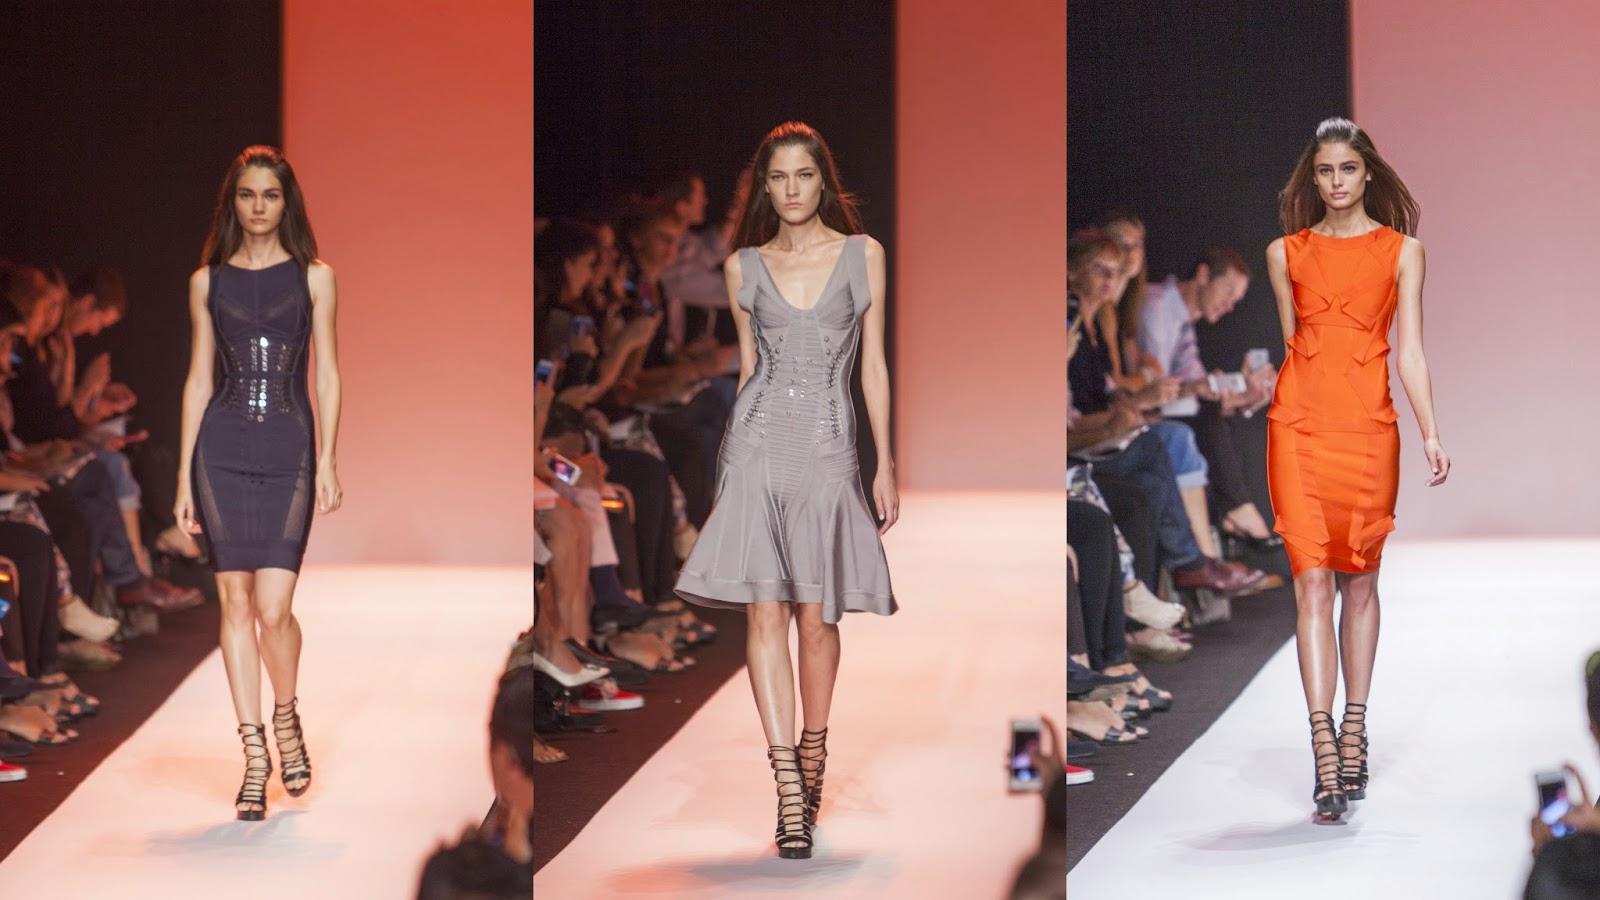 Mercedes-Benz Fashion Week New York: Hervé Léger by Max Azria